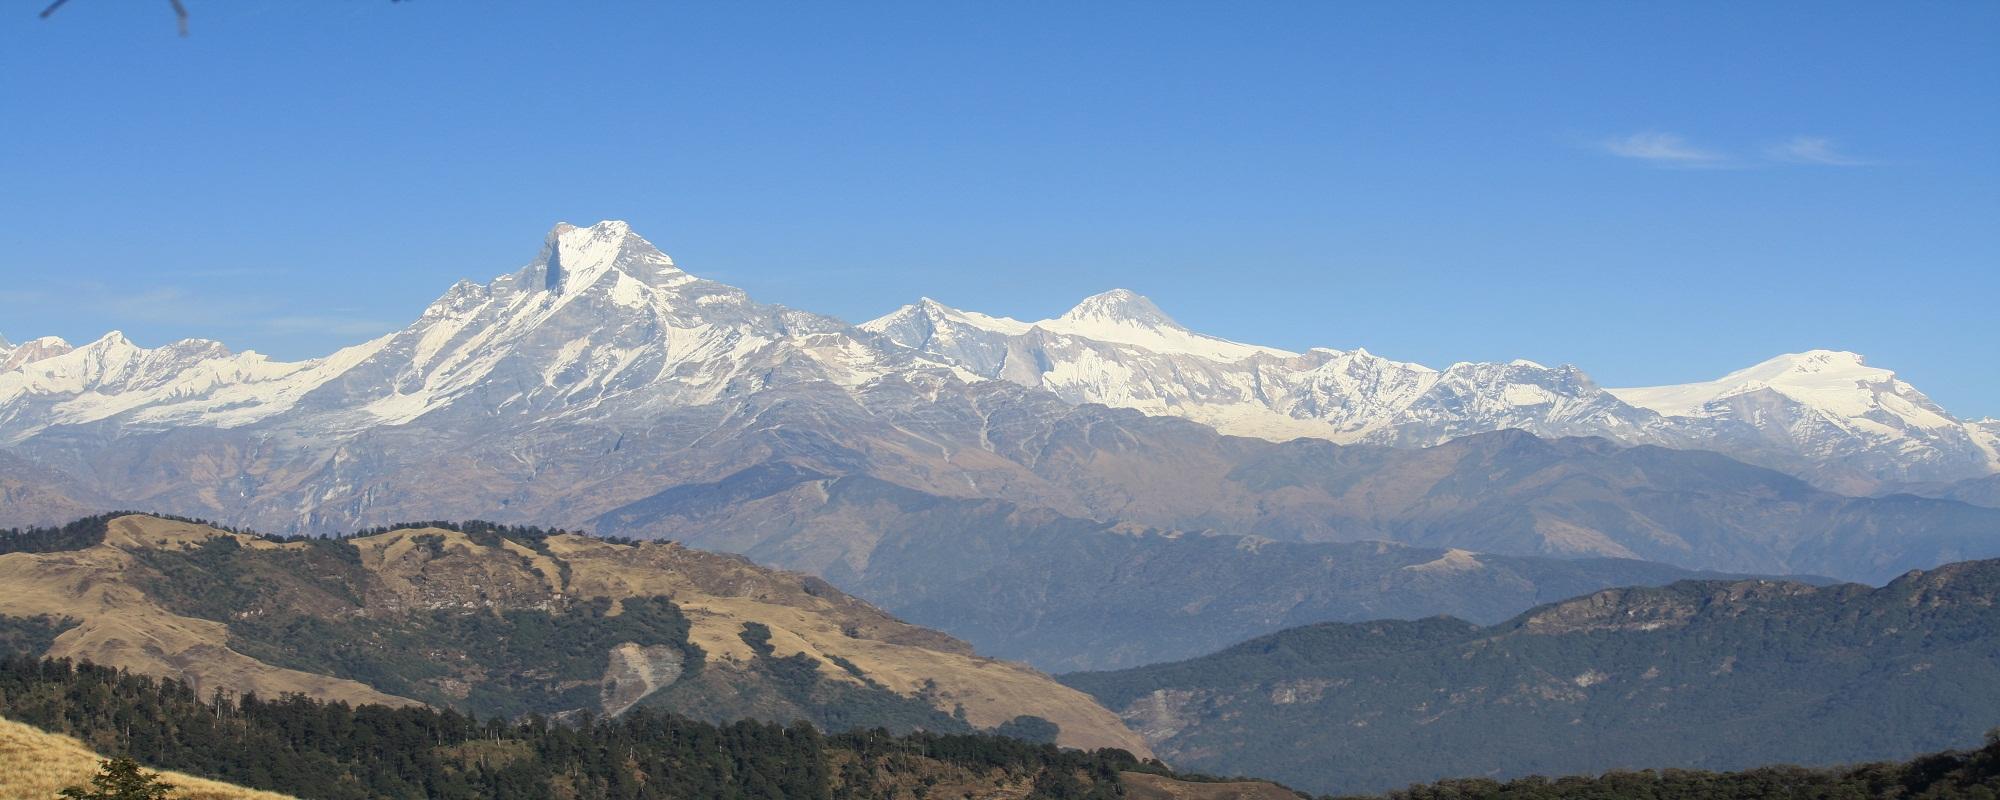 Kathmandu/Pokhara Tour